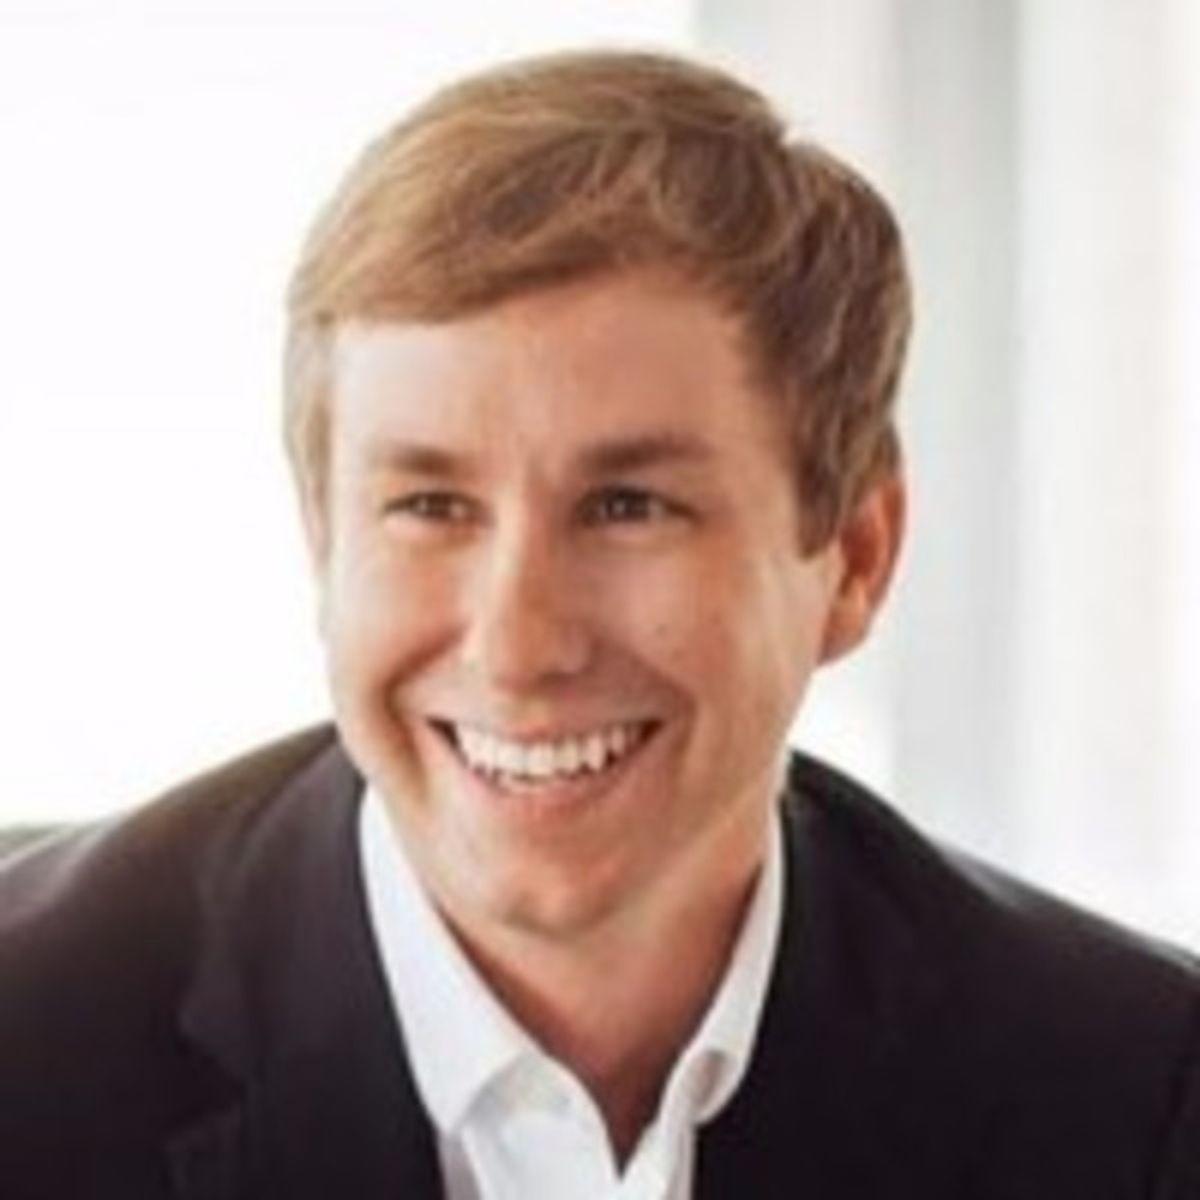 Photo of Jason Story, General Partner at Interlock Partners